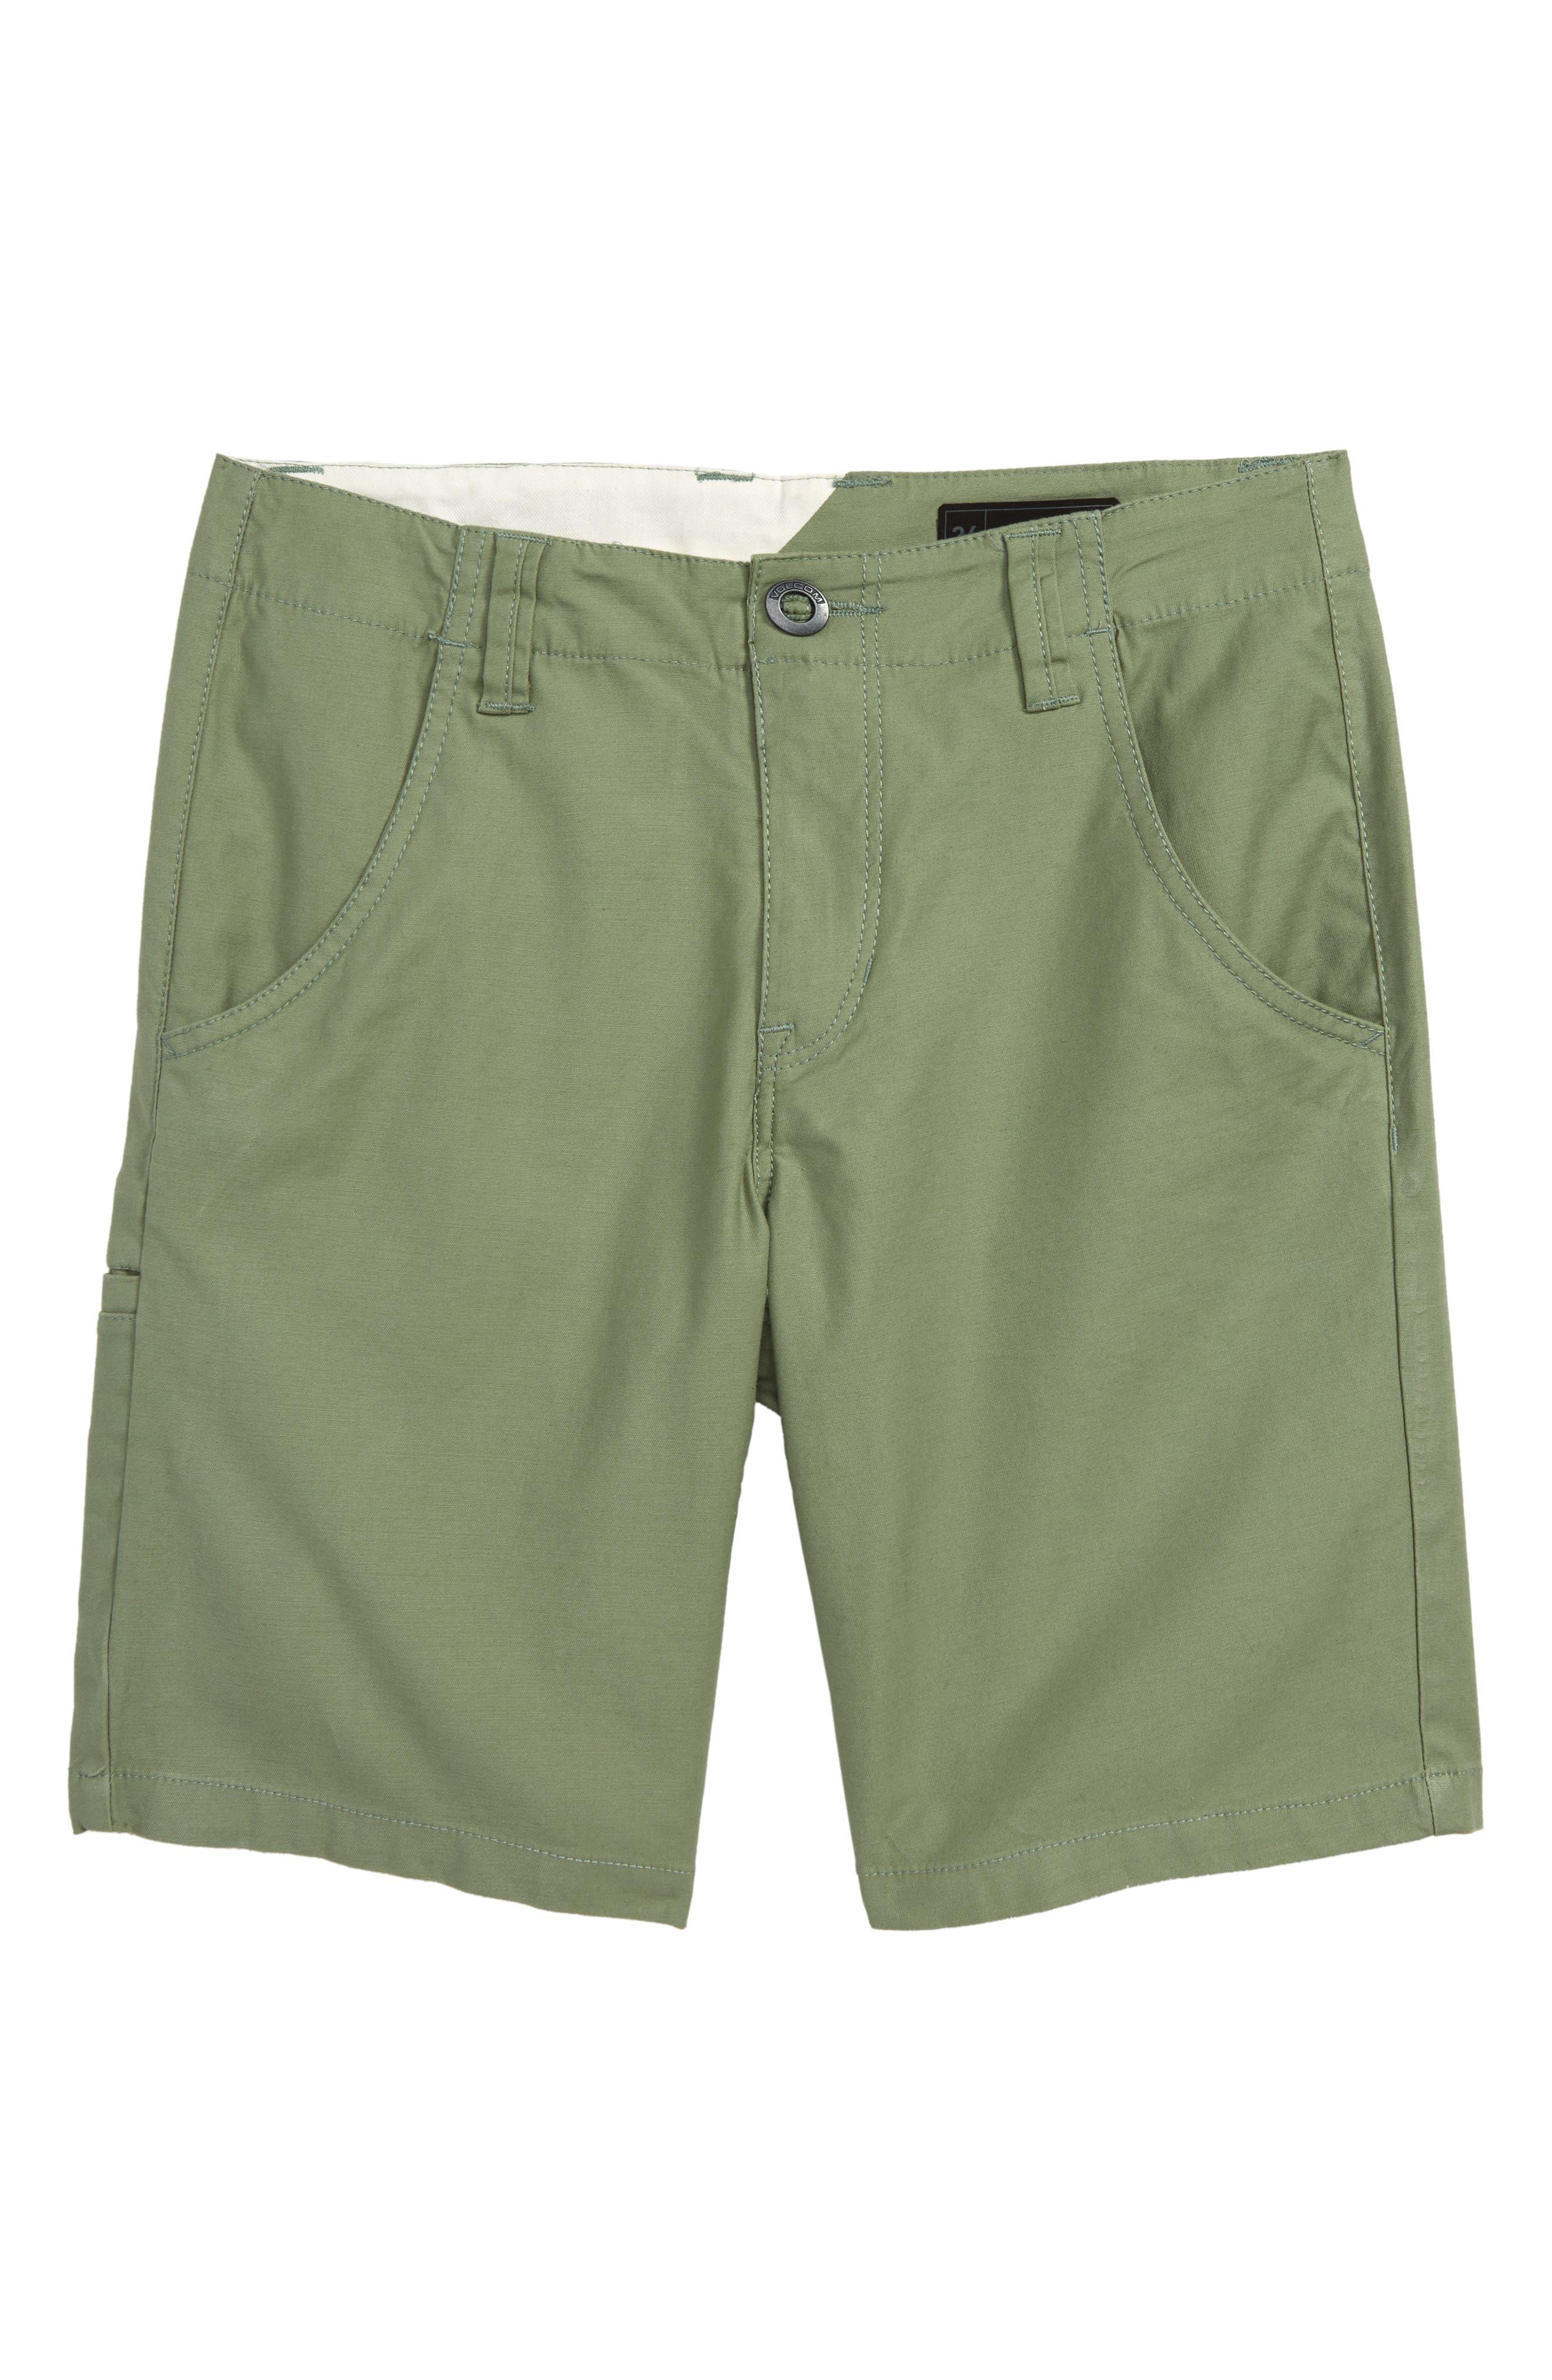 VOLCOM Riser Shorts, Main, color, FADED ARMY